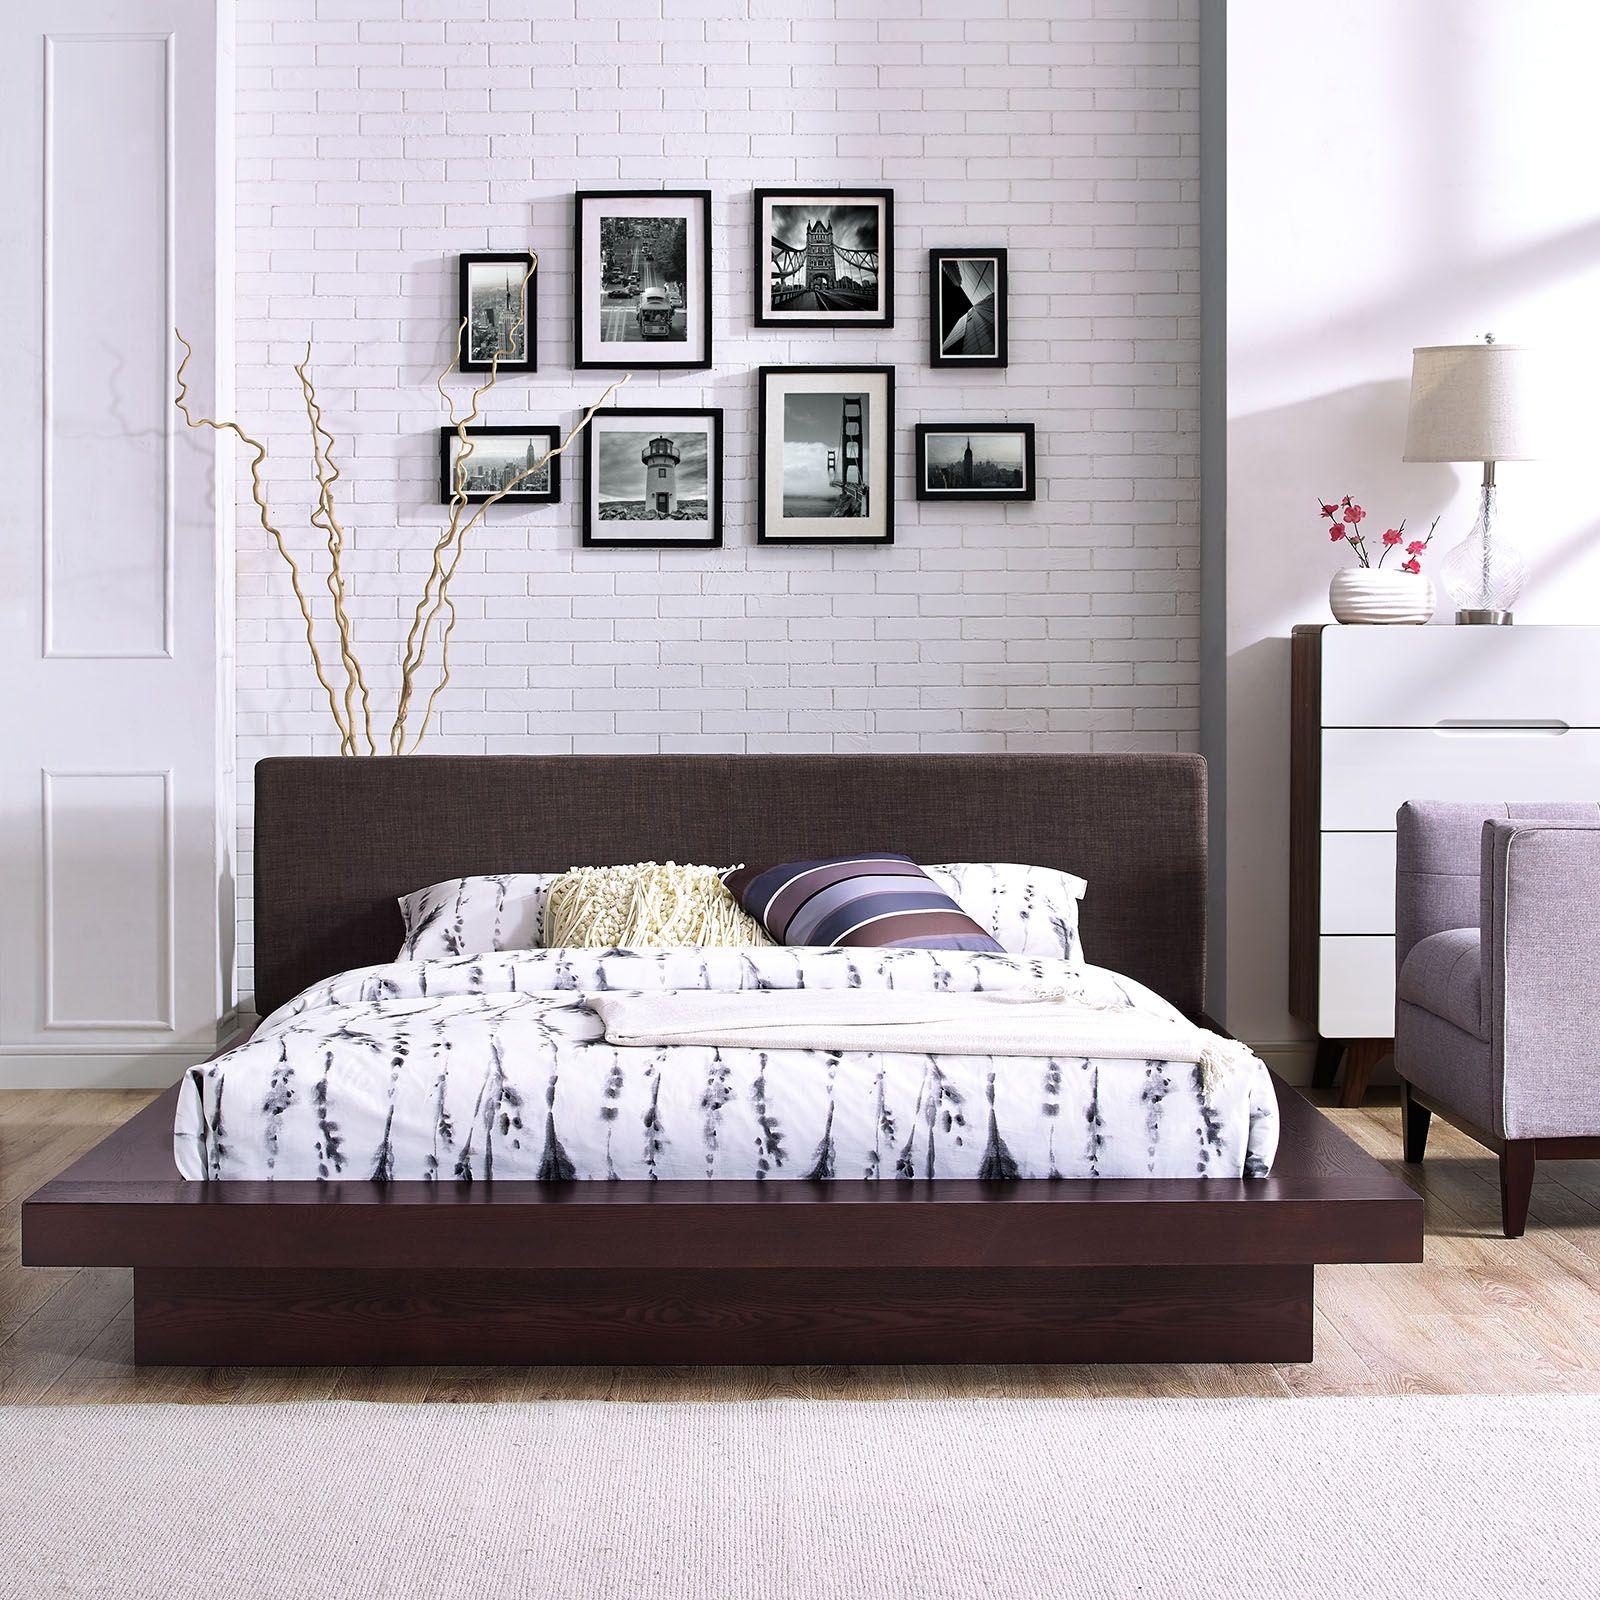 Freja 5721 Cappuccino Queen Platform Bed With Dark Brown Fabric